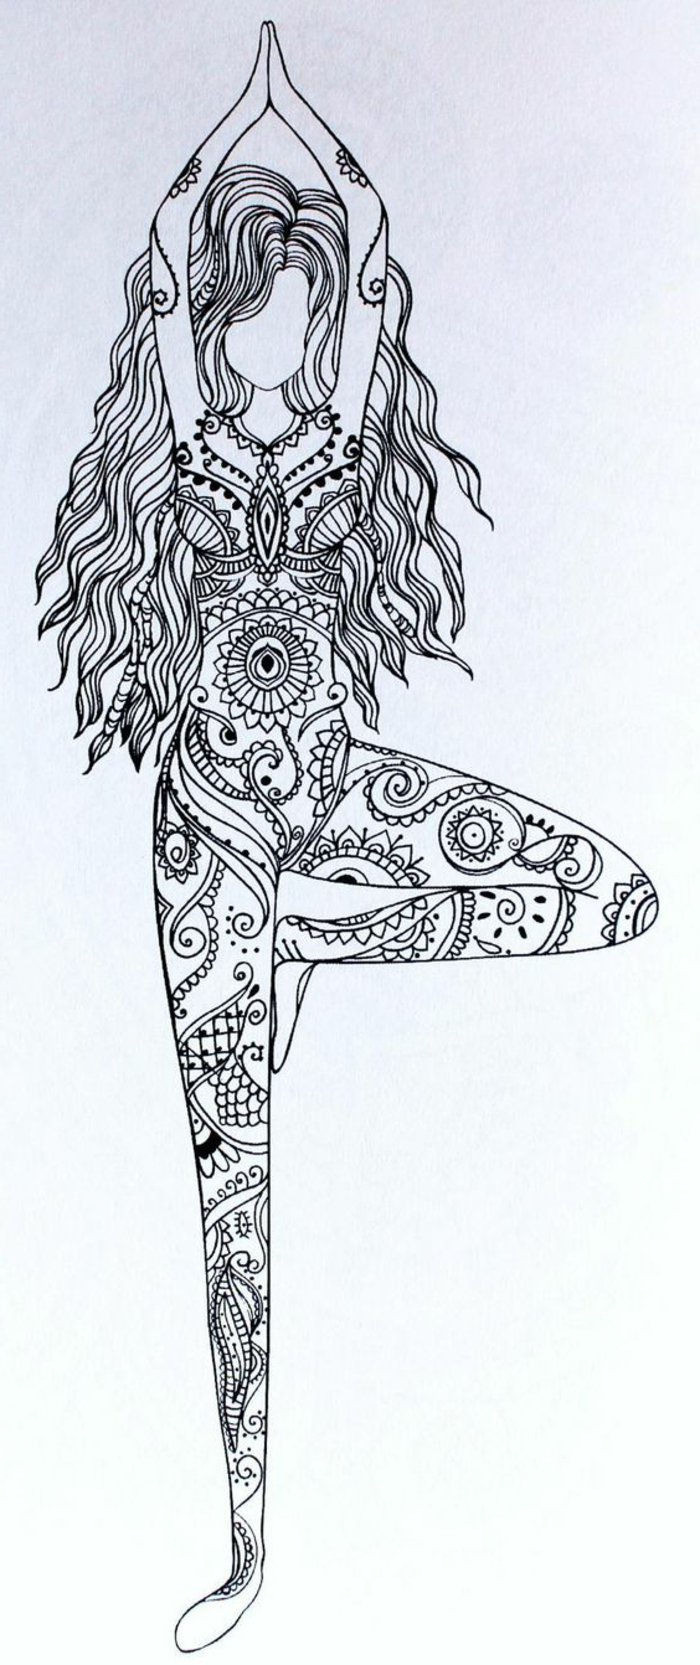 Mandalas Zum Ausdrucken Herzen Genial Mandala Slikarstvo – Detaljne Upute I Brojne Tehnike Frisch Bilder